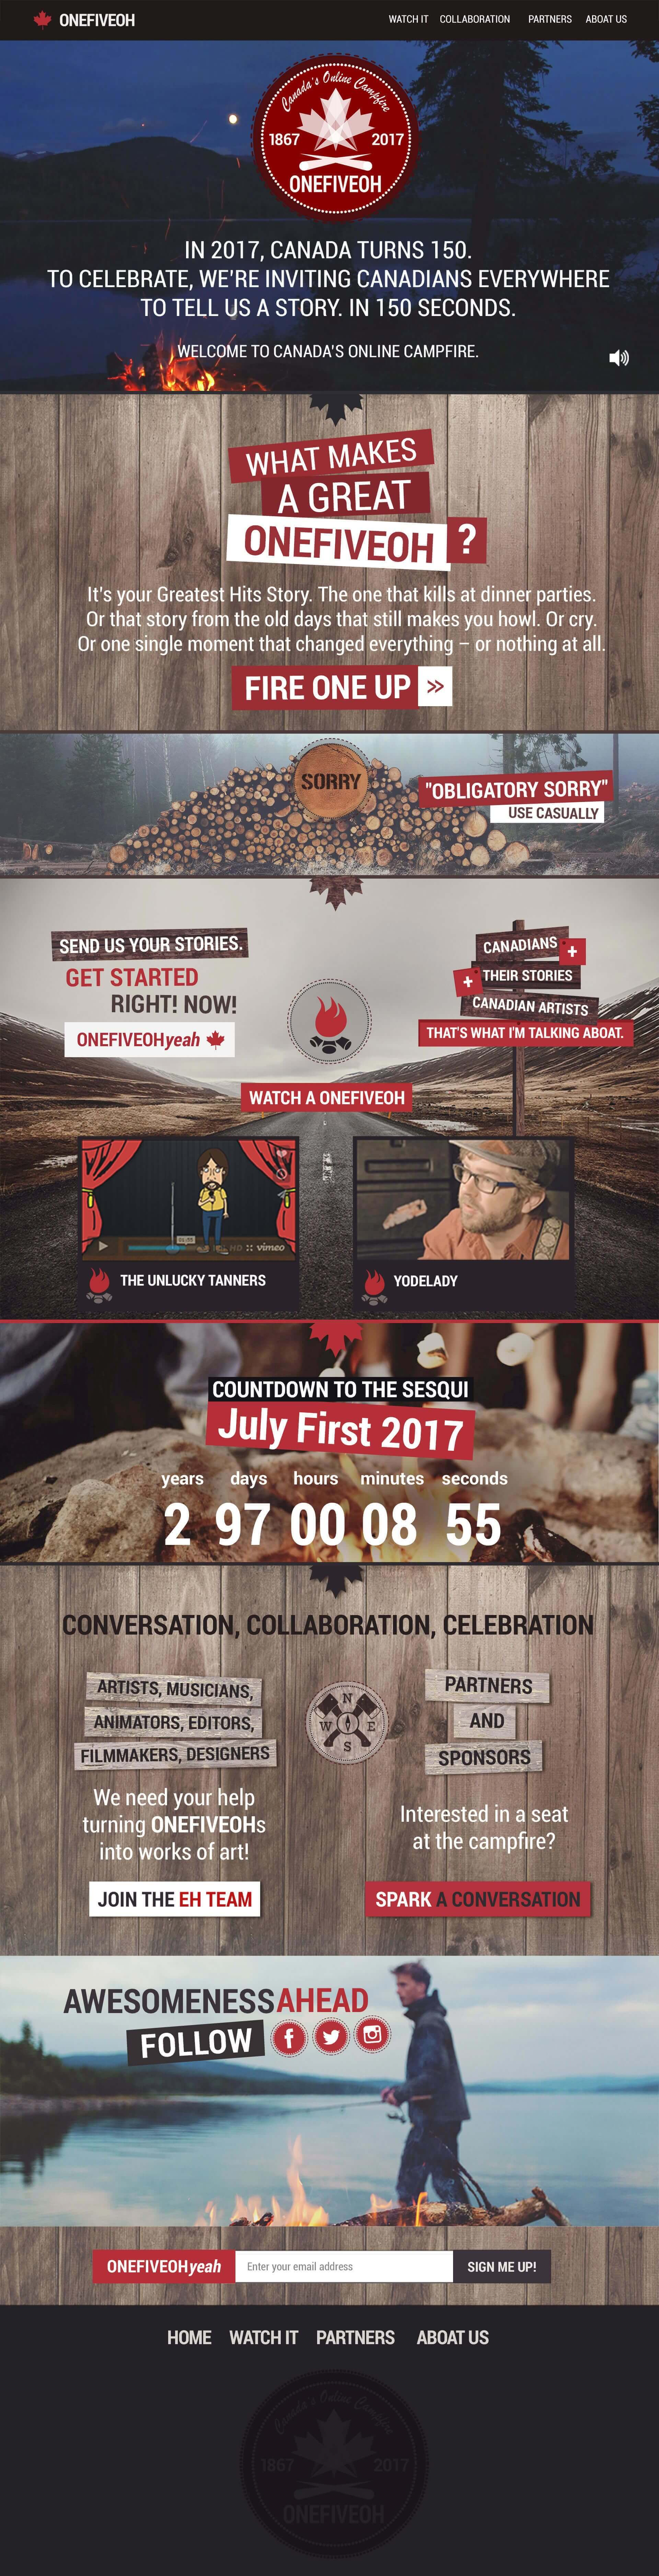 ONEFIVEOH - Canada's Online Campfire (Адаптивная верстка. Landing)